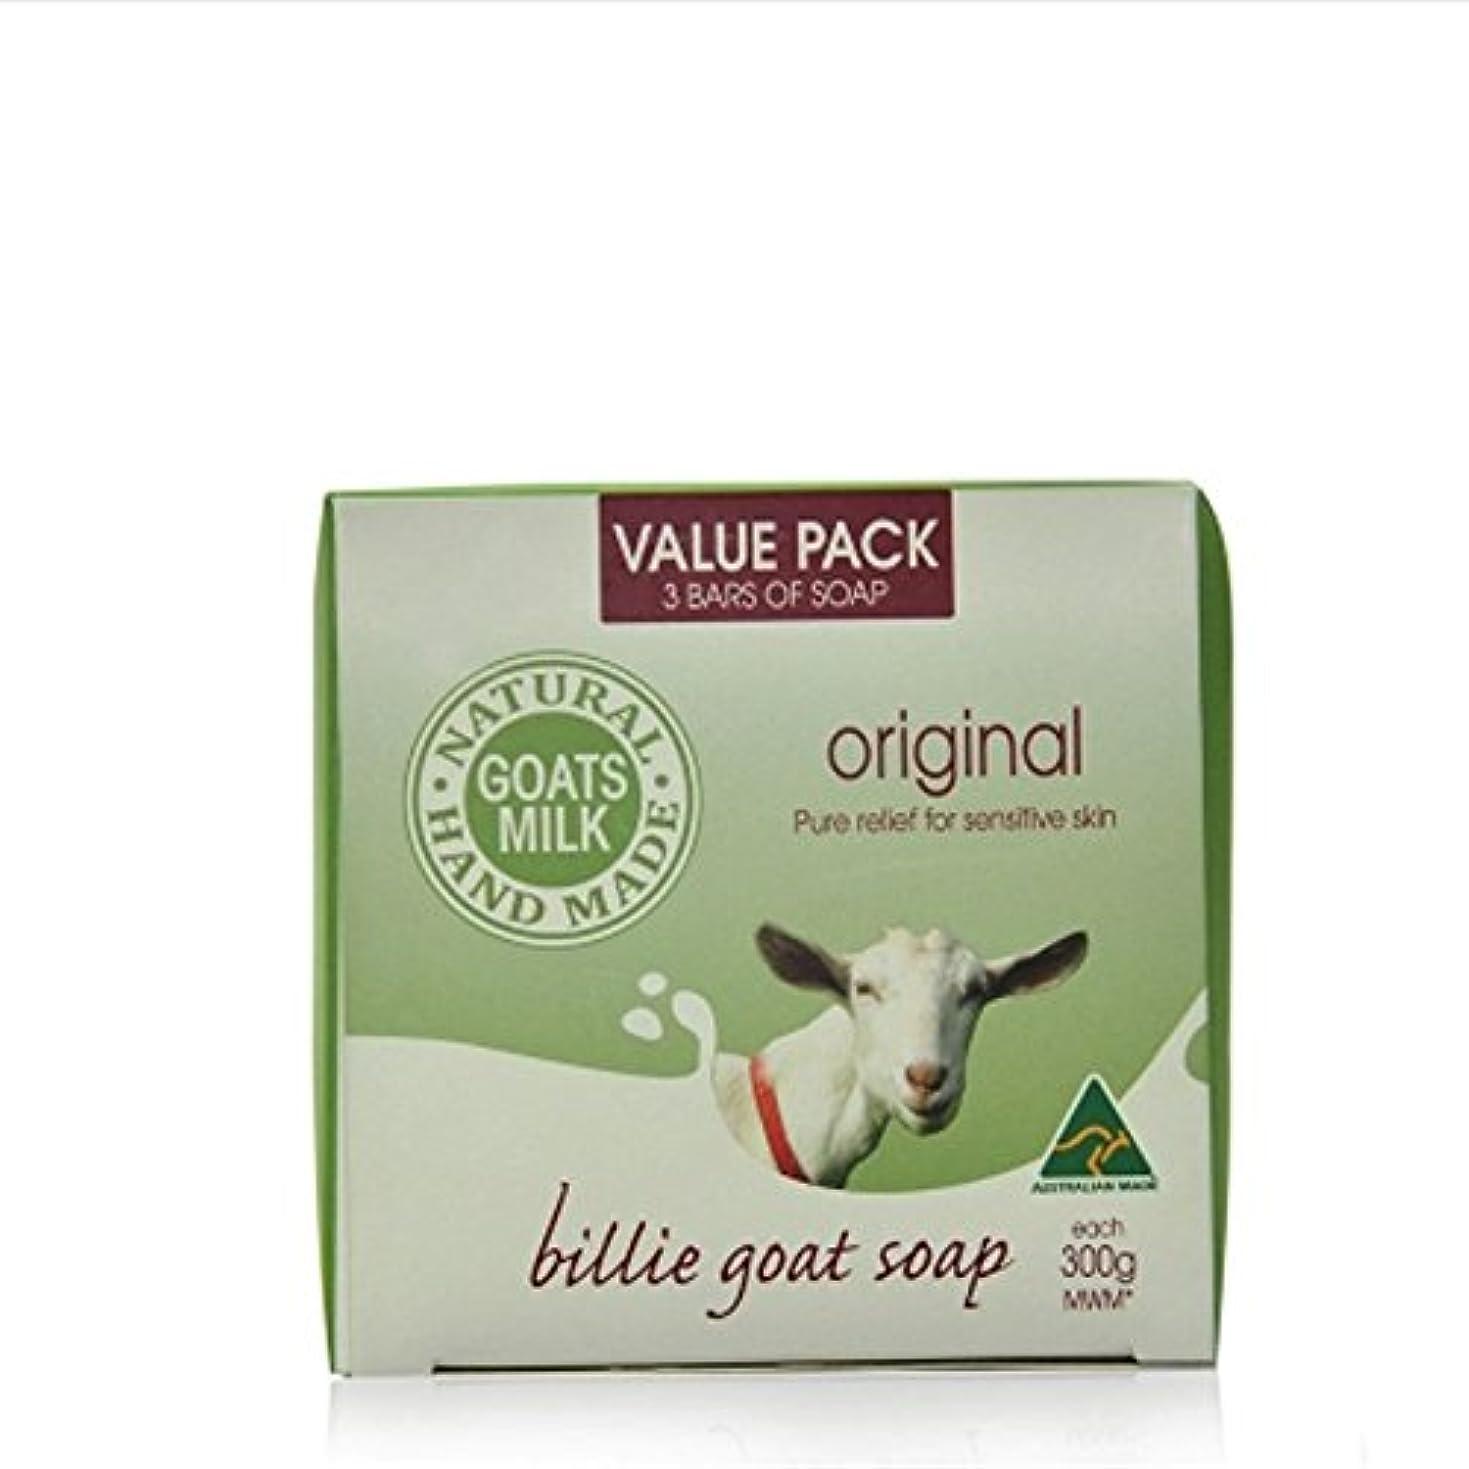 [Billie Goat Soap]ビリーゴートソープ(ナチュラル)お徳用3個セット[海外直送品]